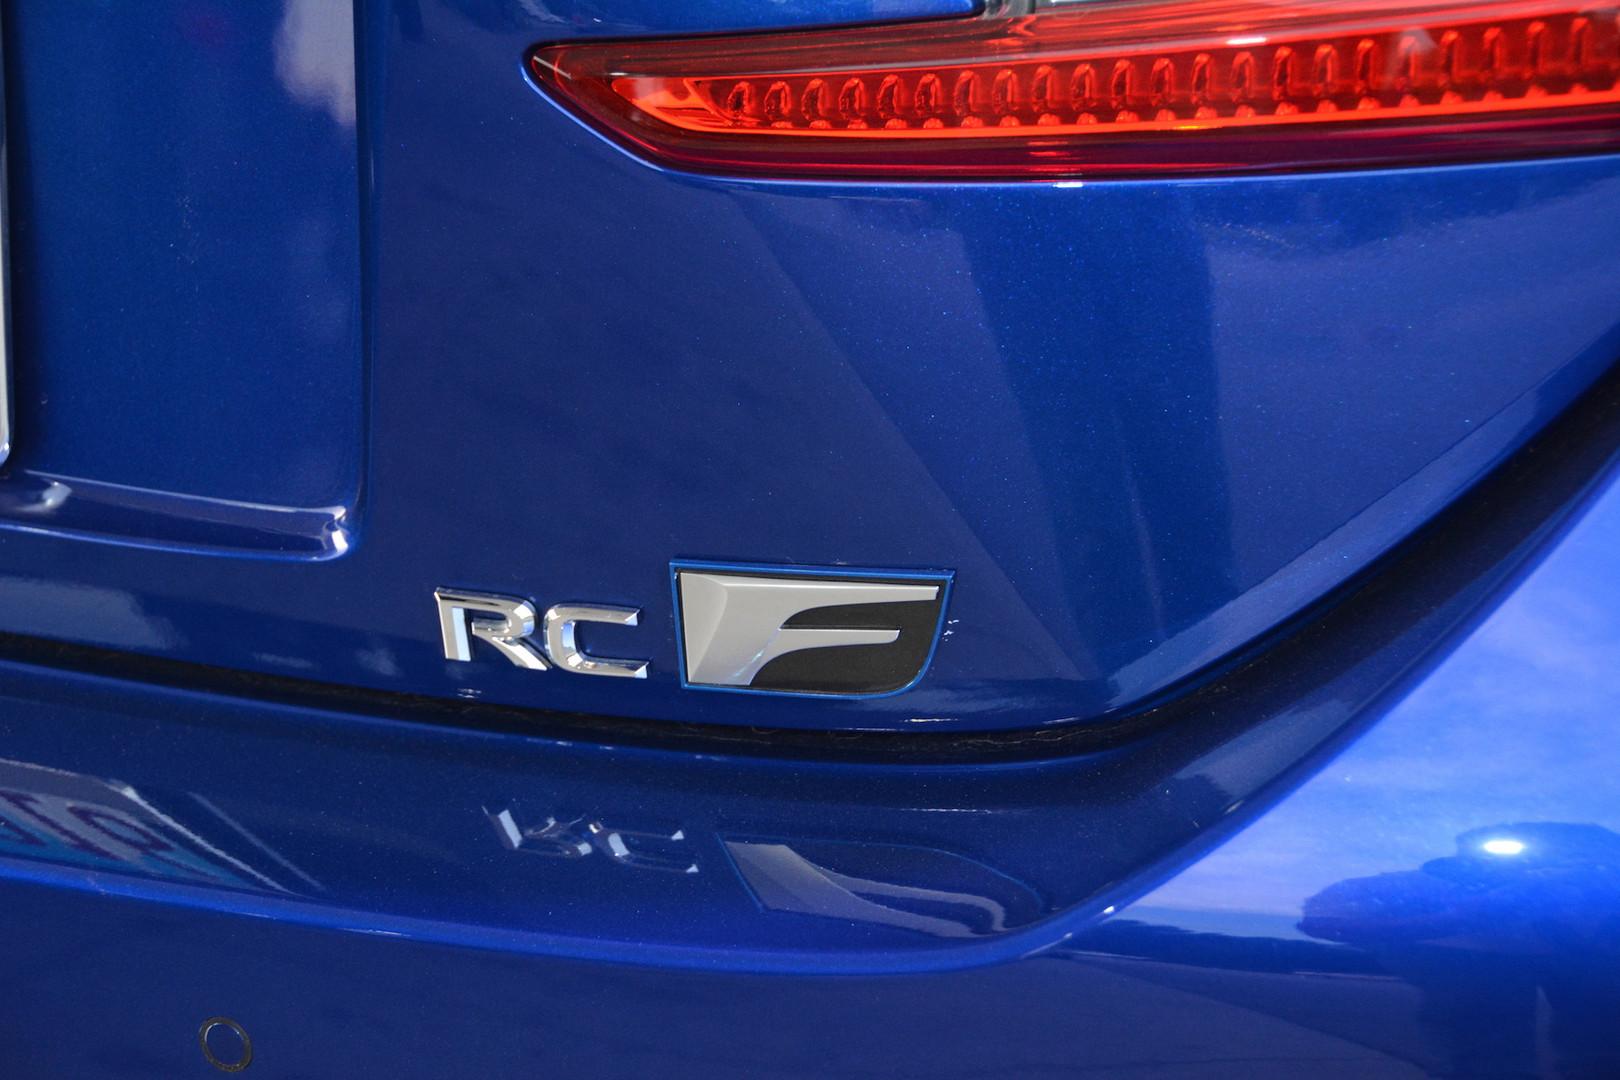 2019 Lexus RC F Logo